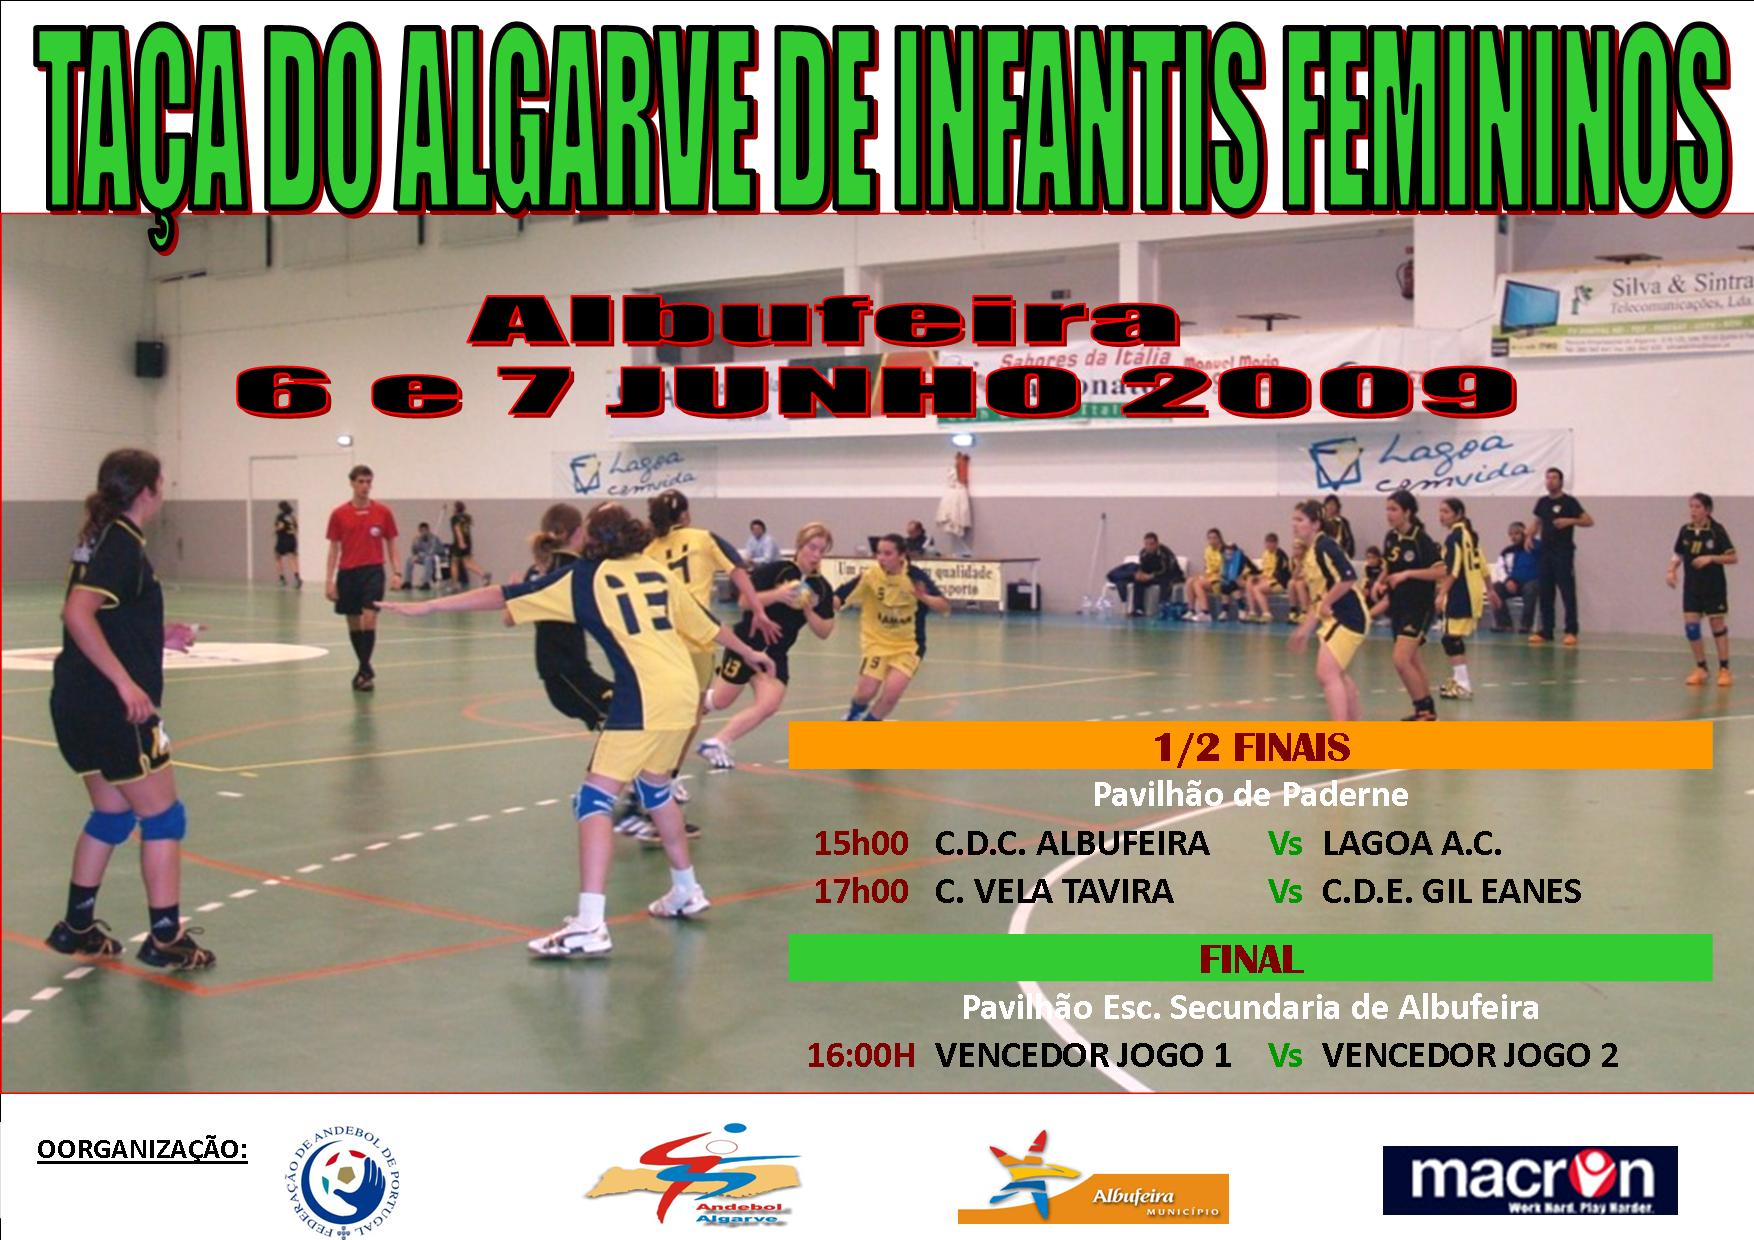 Taça do Algarve de Infantis Femininos